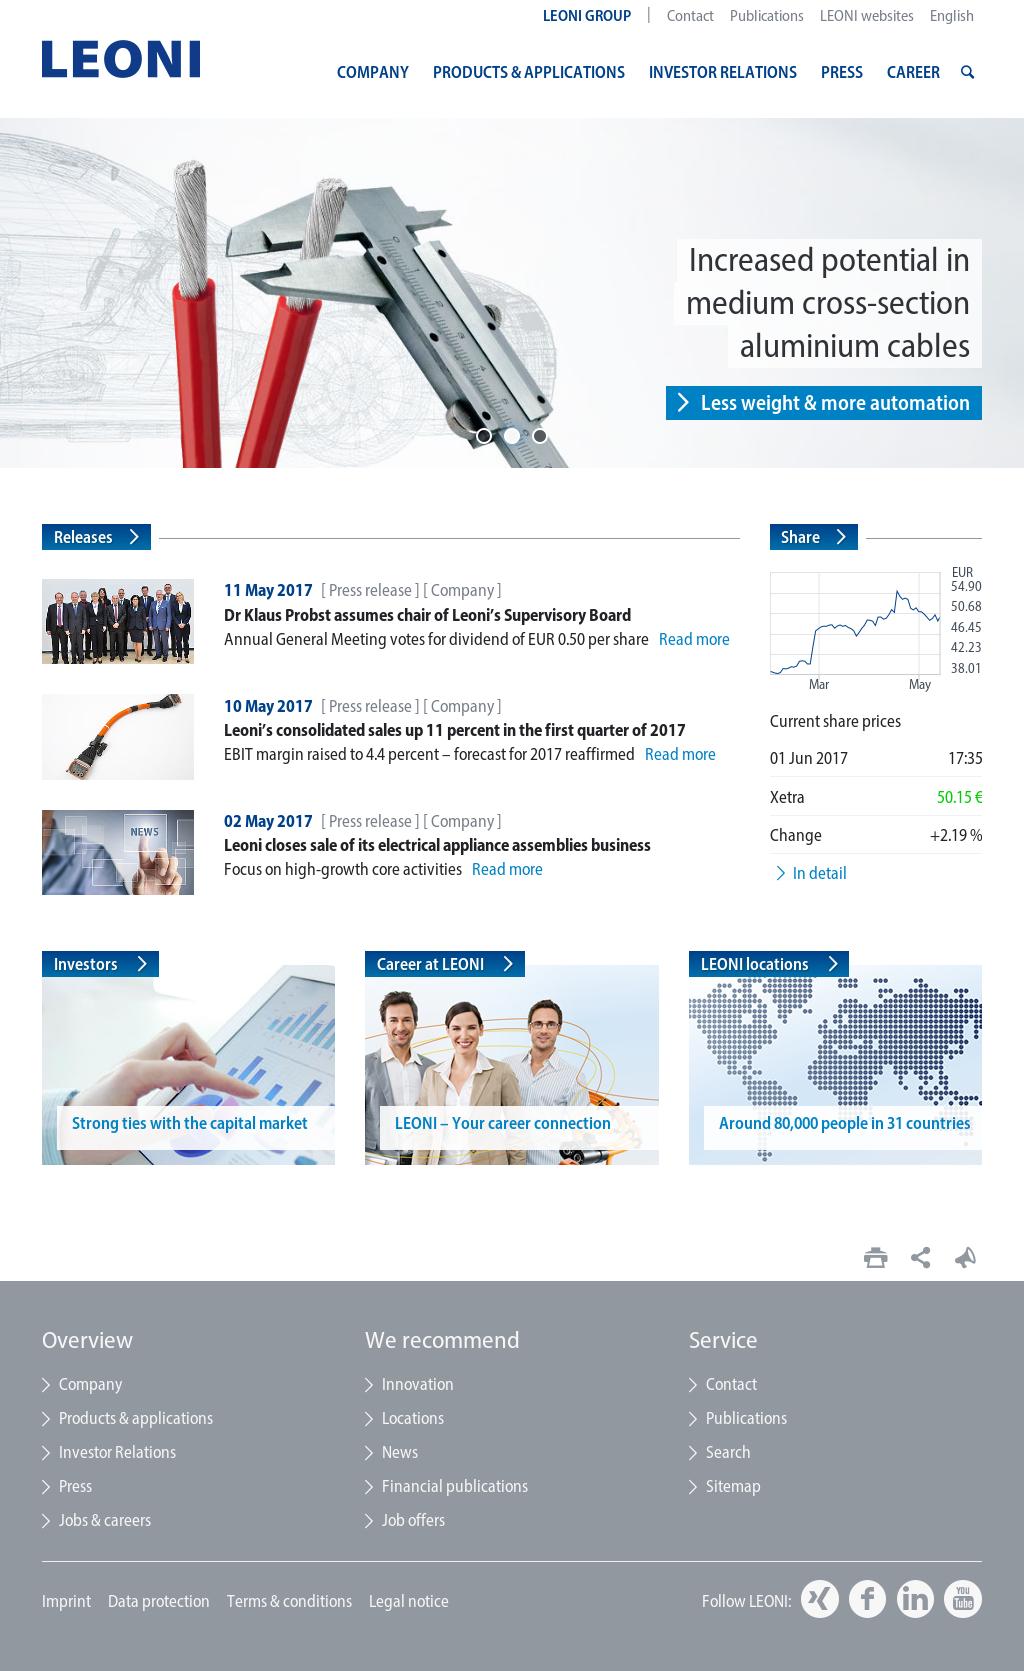 LEONI Competitors, Revenue and Employees - Owler Company Profile